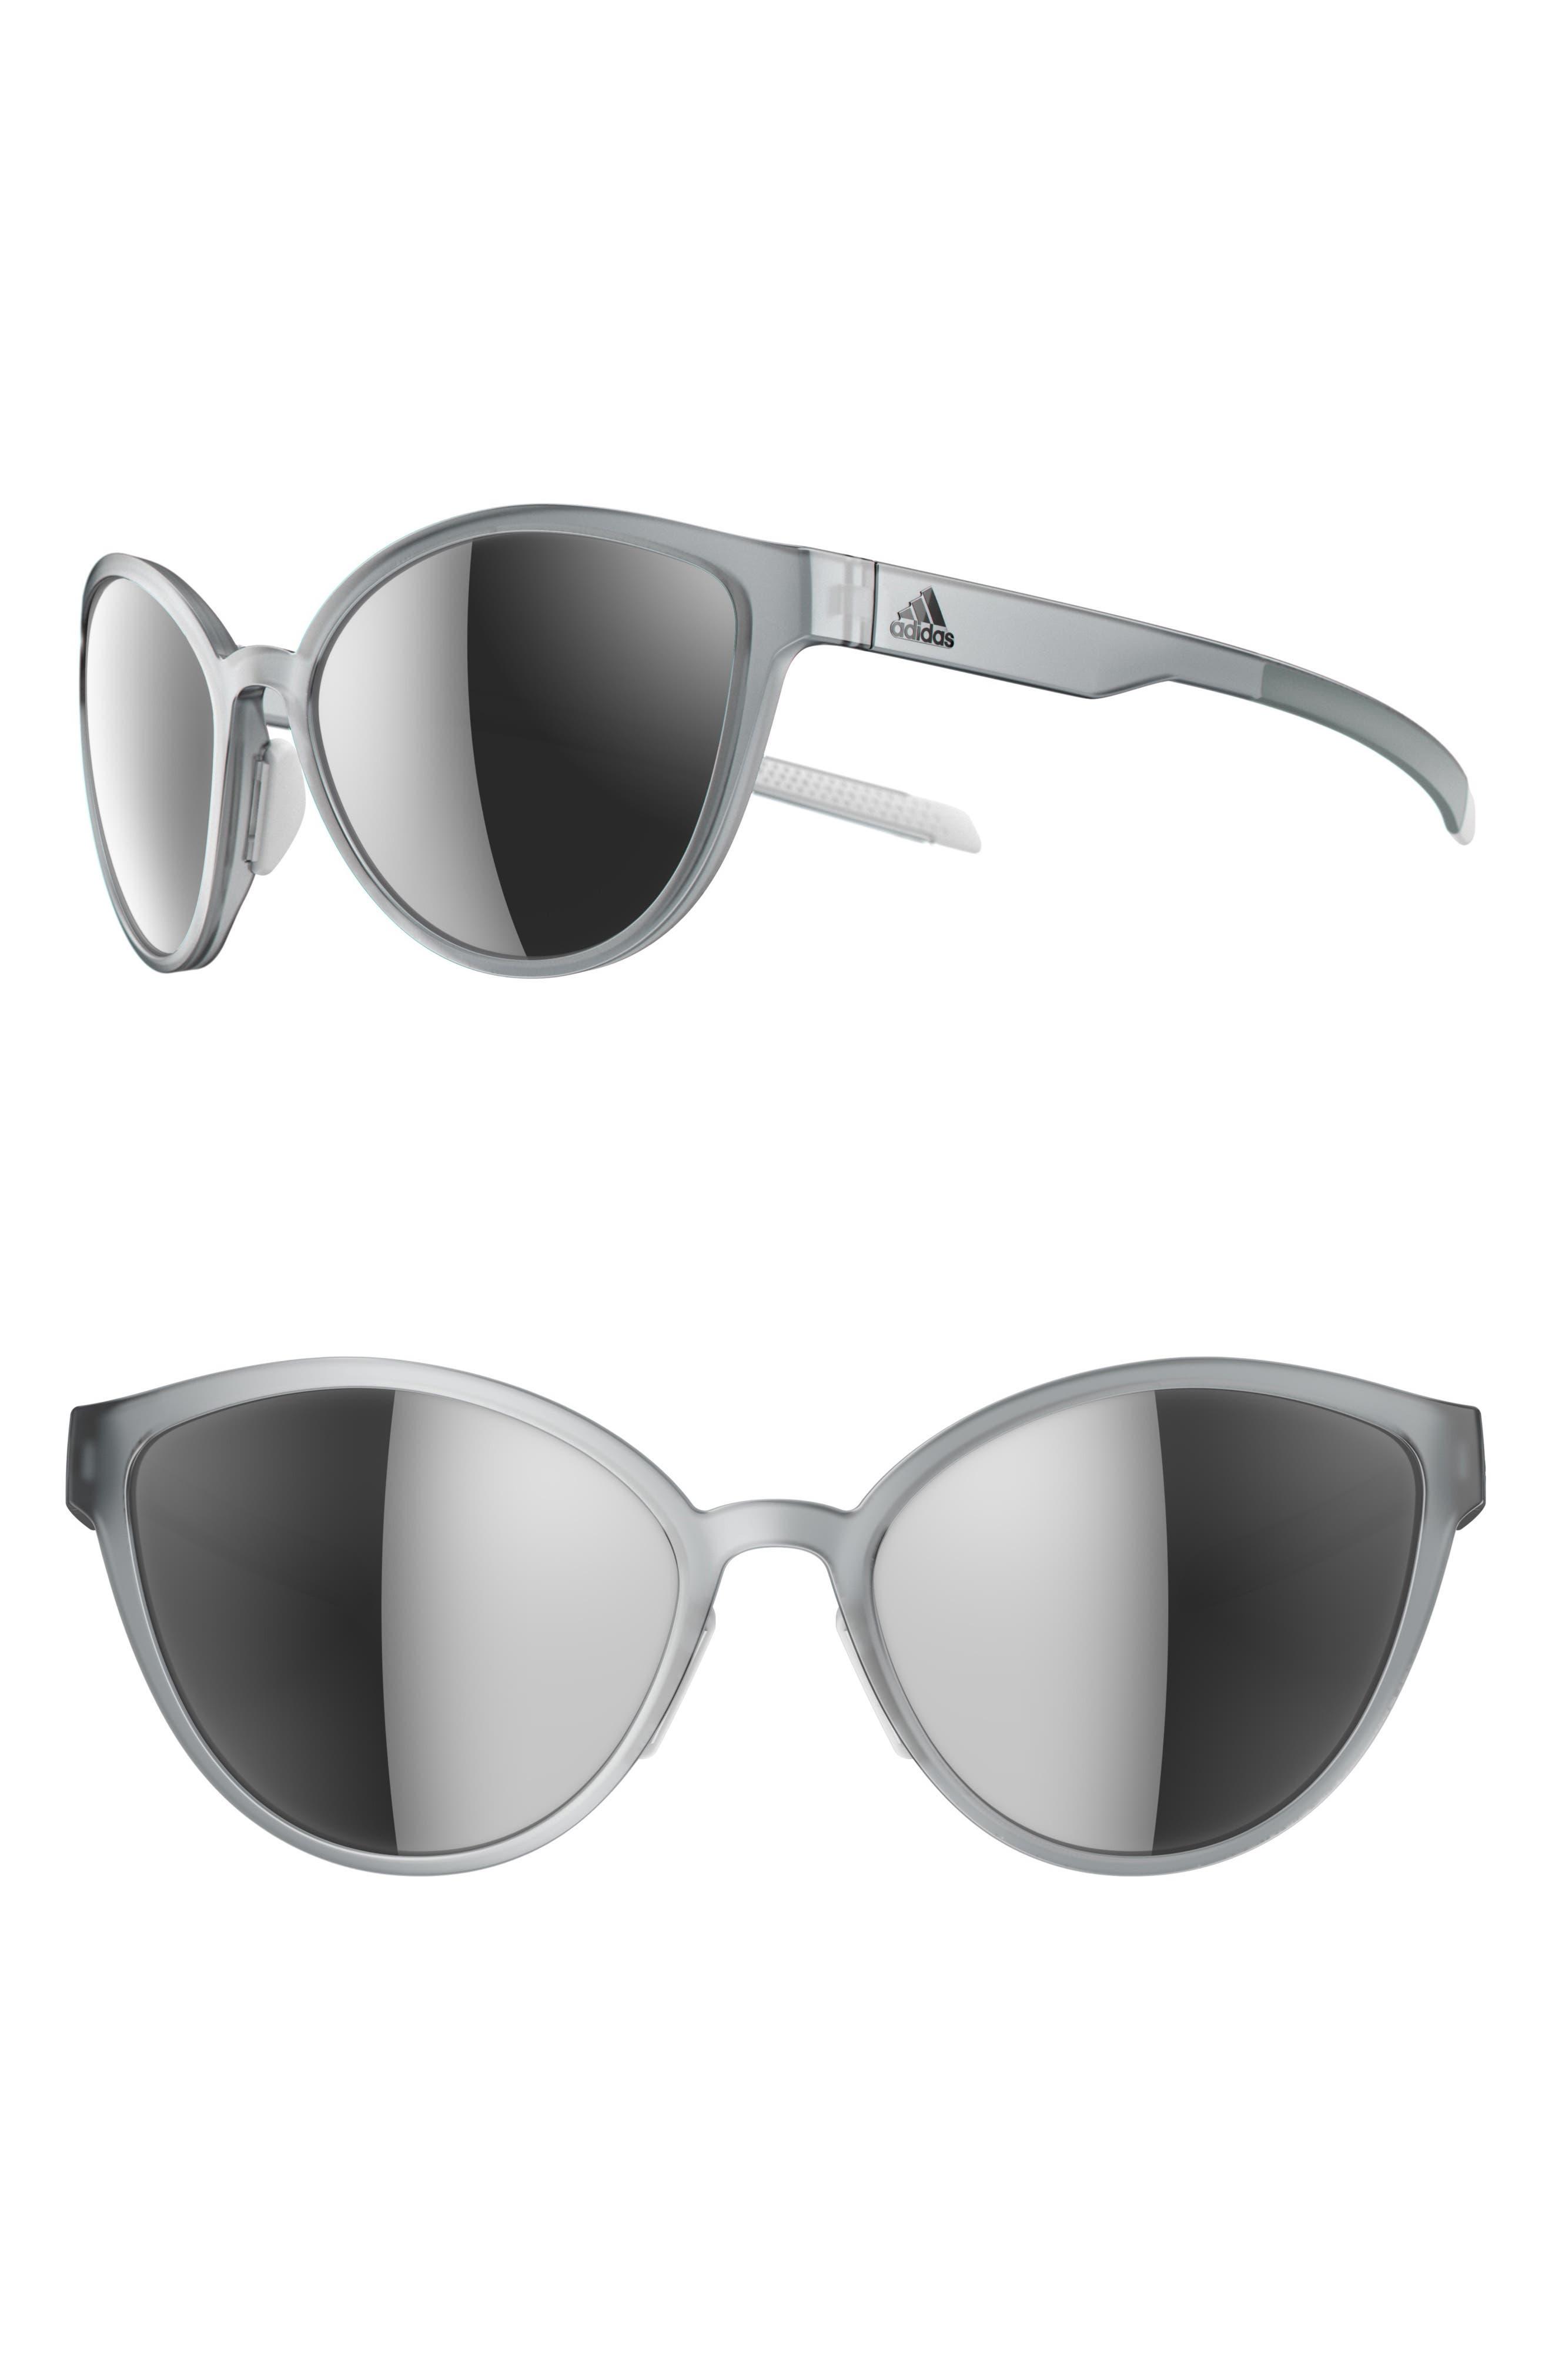 ADIDAS, Tempest 56mm Mirrored Cat Eye Running Sunglasses, Main thumbnail 1, color, CRYSTAL GREY/ CHROME